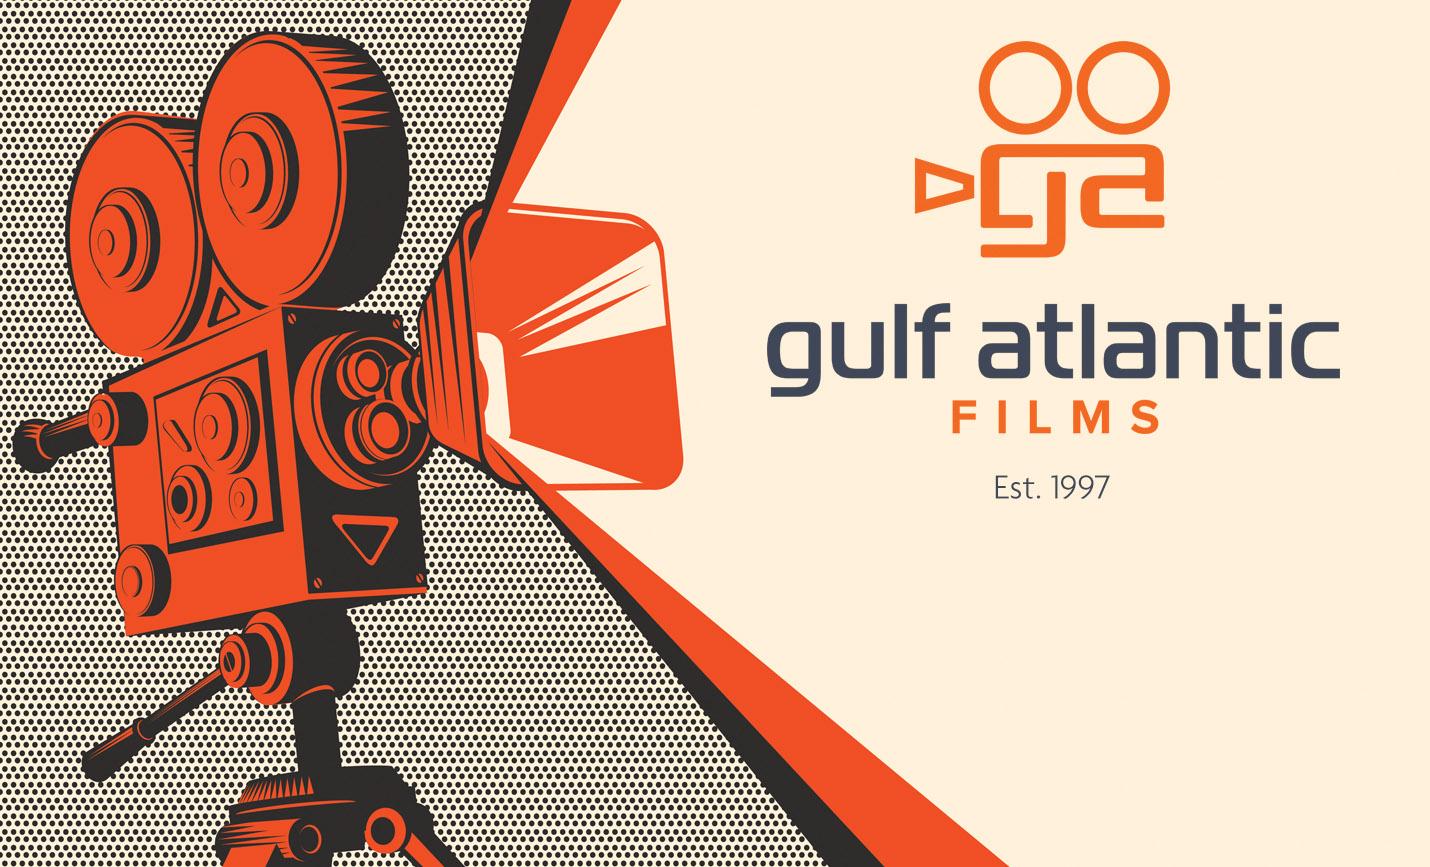 Gulf Atlantic Films Main Slide